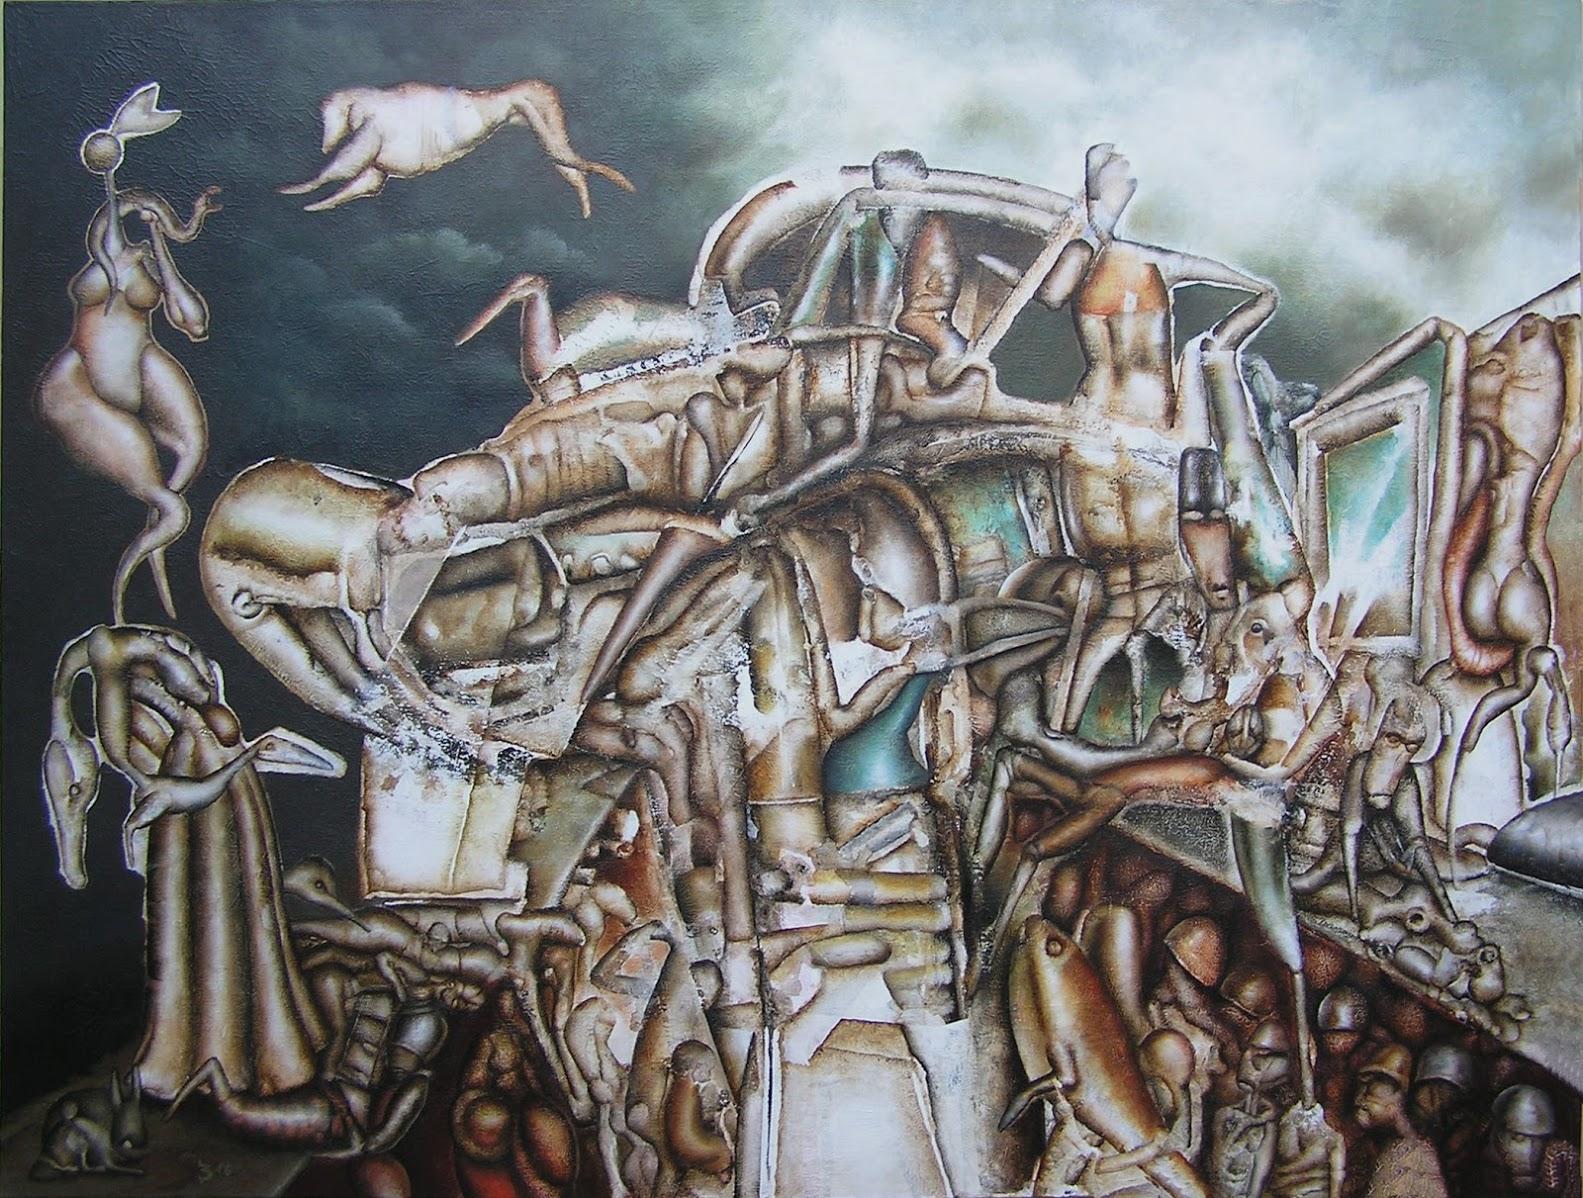 Cataclysm, 80x60, 2016-06-04